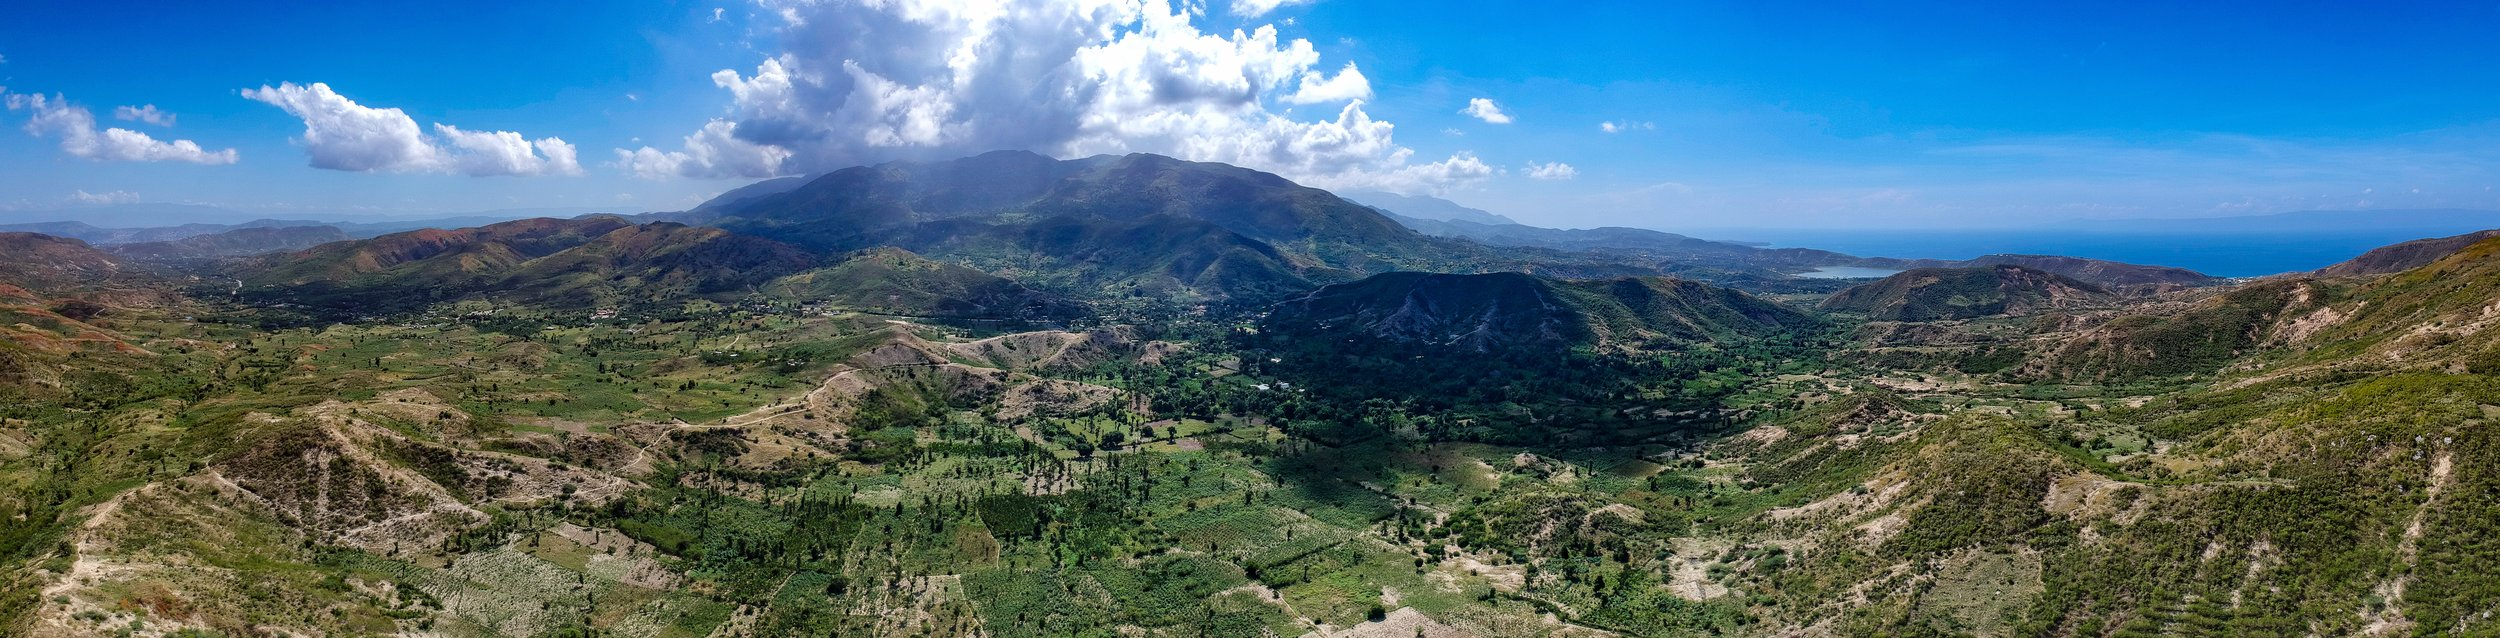 Haiti 9-2017-19 4web.jpg